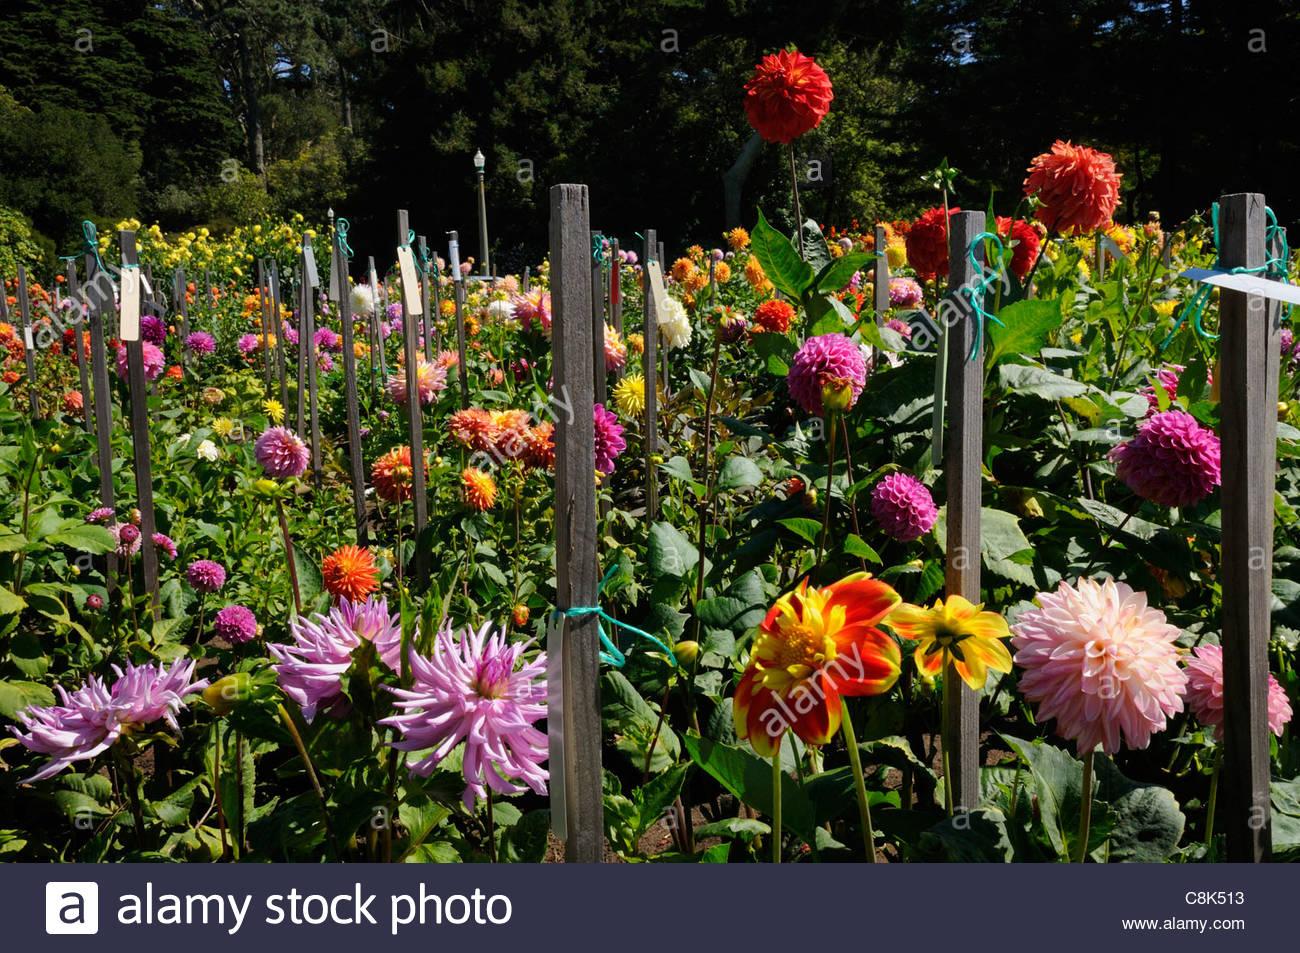 Numerous colorful varieties of dahlias fill the dahlia garden numerous colorful varieties of dahlias fill the dahlia garden outside the conservatory of flowers san francisco ca izmirmasajfo